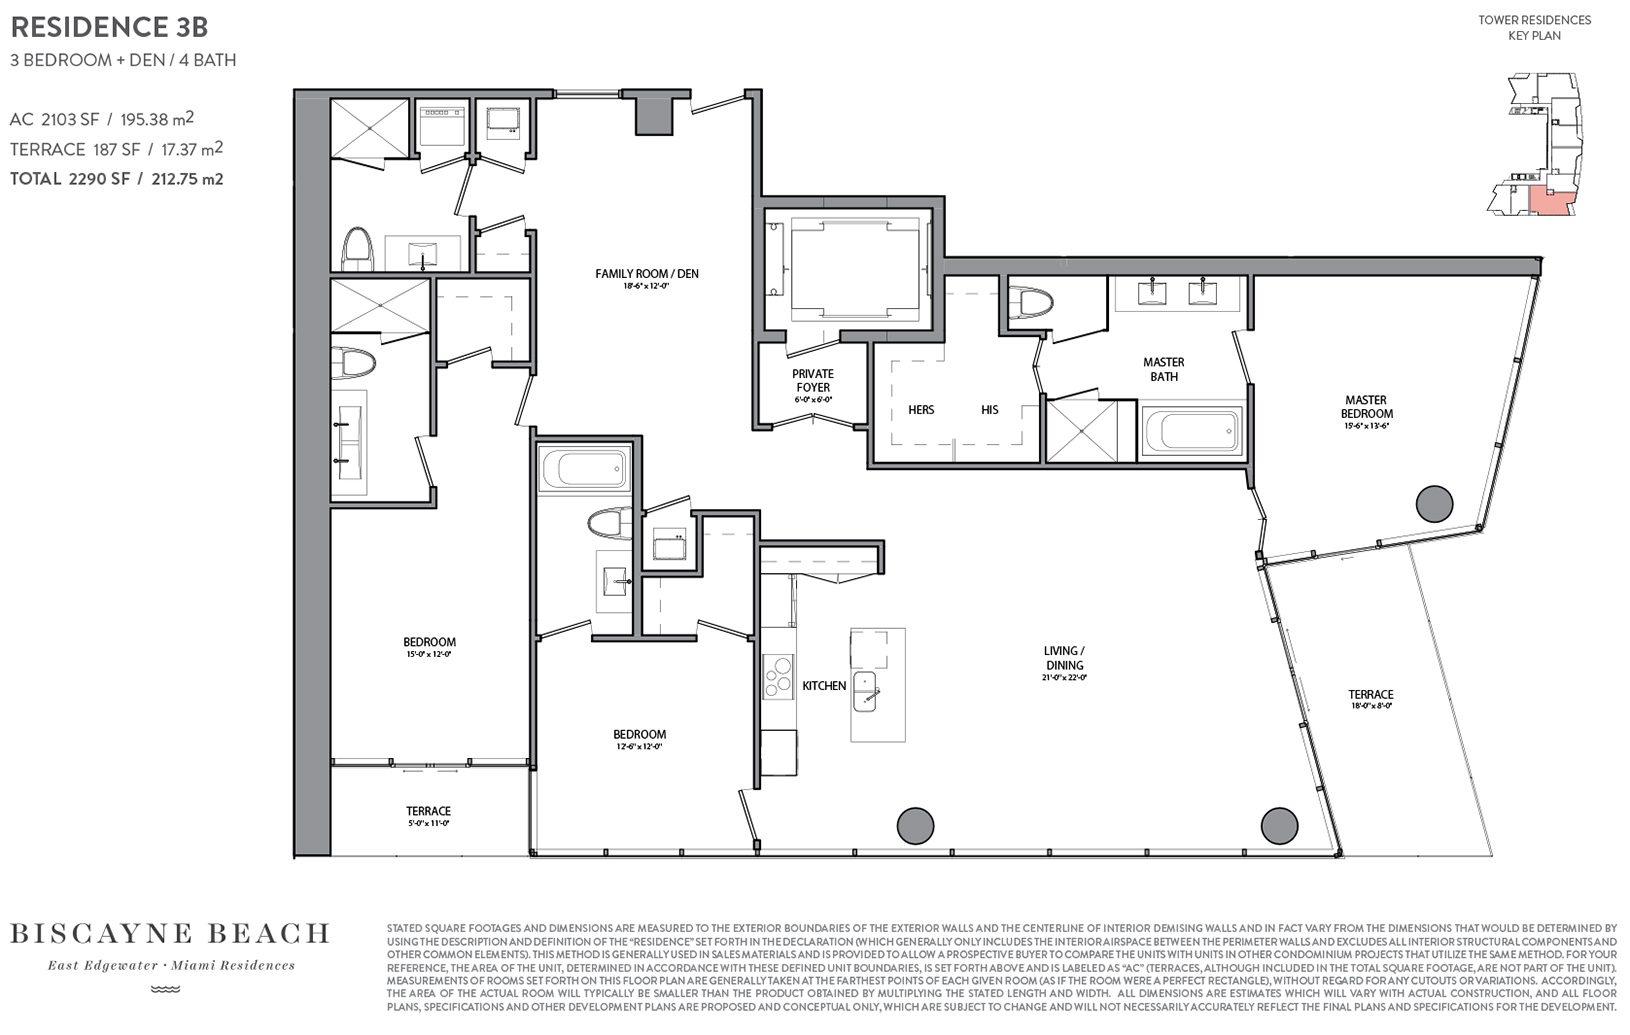 biscayne-beach-condo-07-line-floor-plan